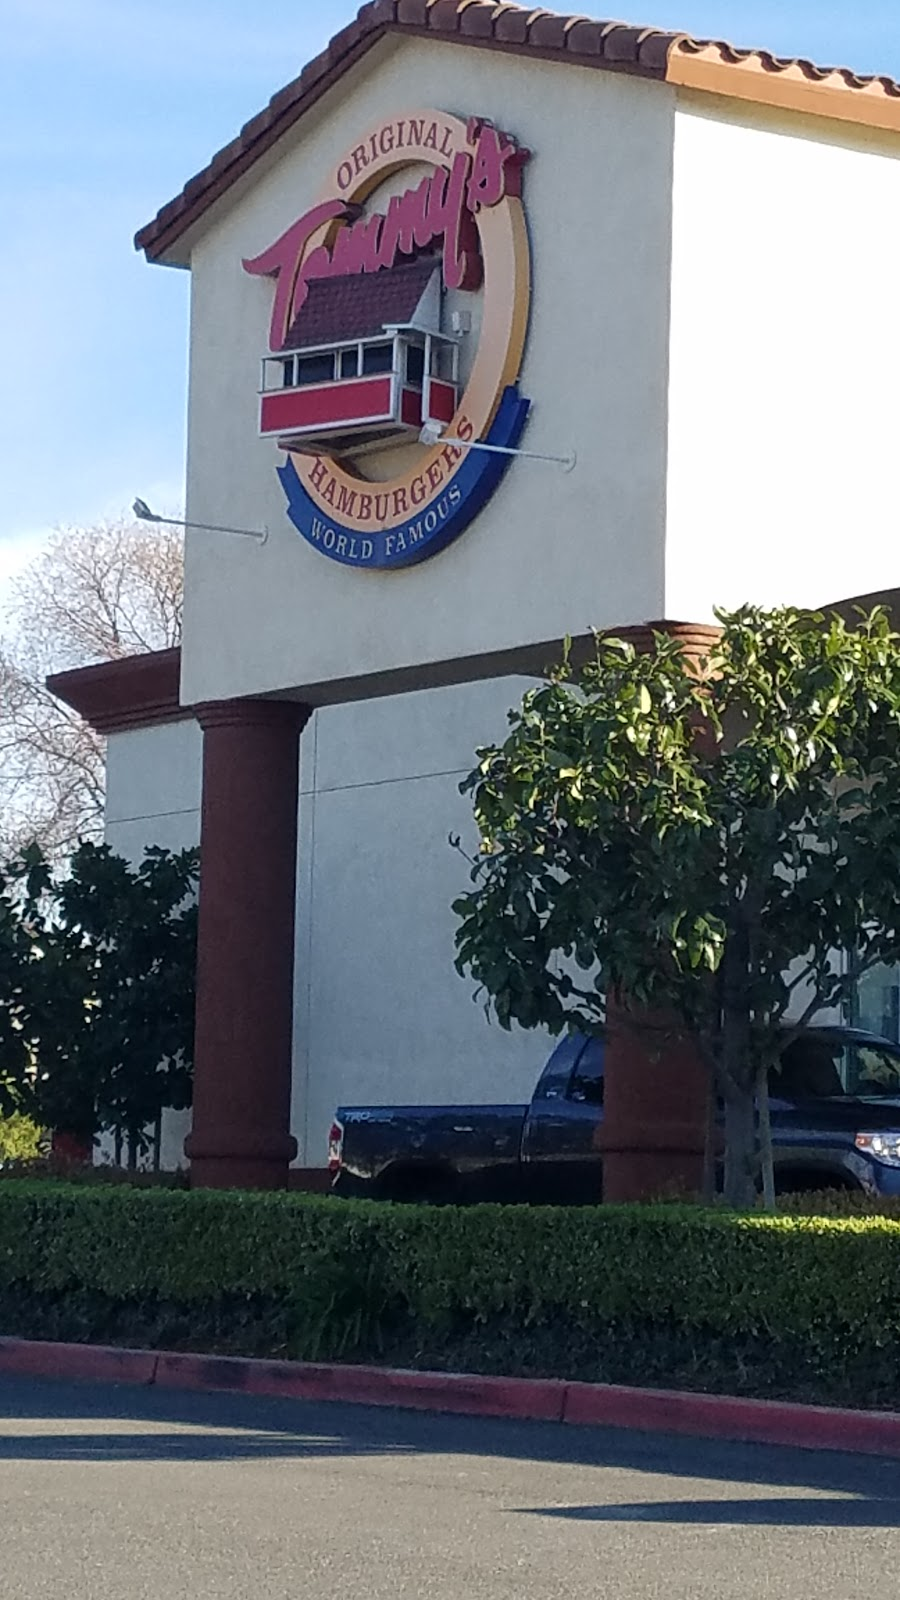 76 - gas station    Photo 4 of 6   Address: 2240 Compton Ave, Corona, CA 92881, USA   Phone: (951) 279-2899